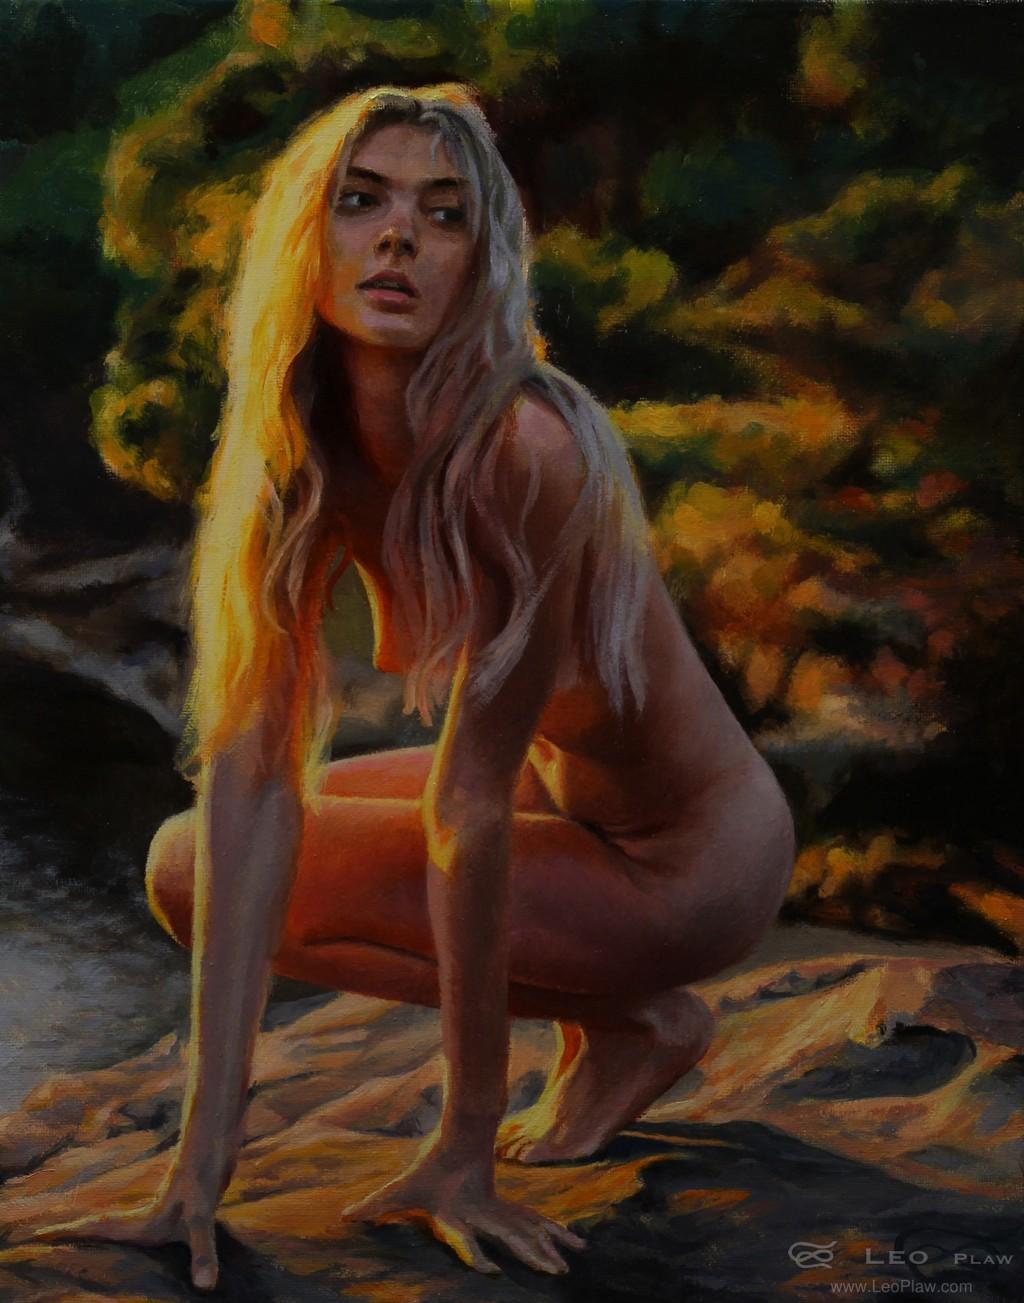 """Golden Light II"", Leo Plaw, 24 x 30cm, oil on canvas"